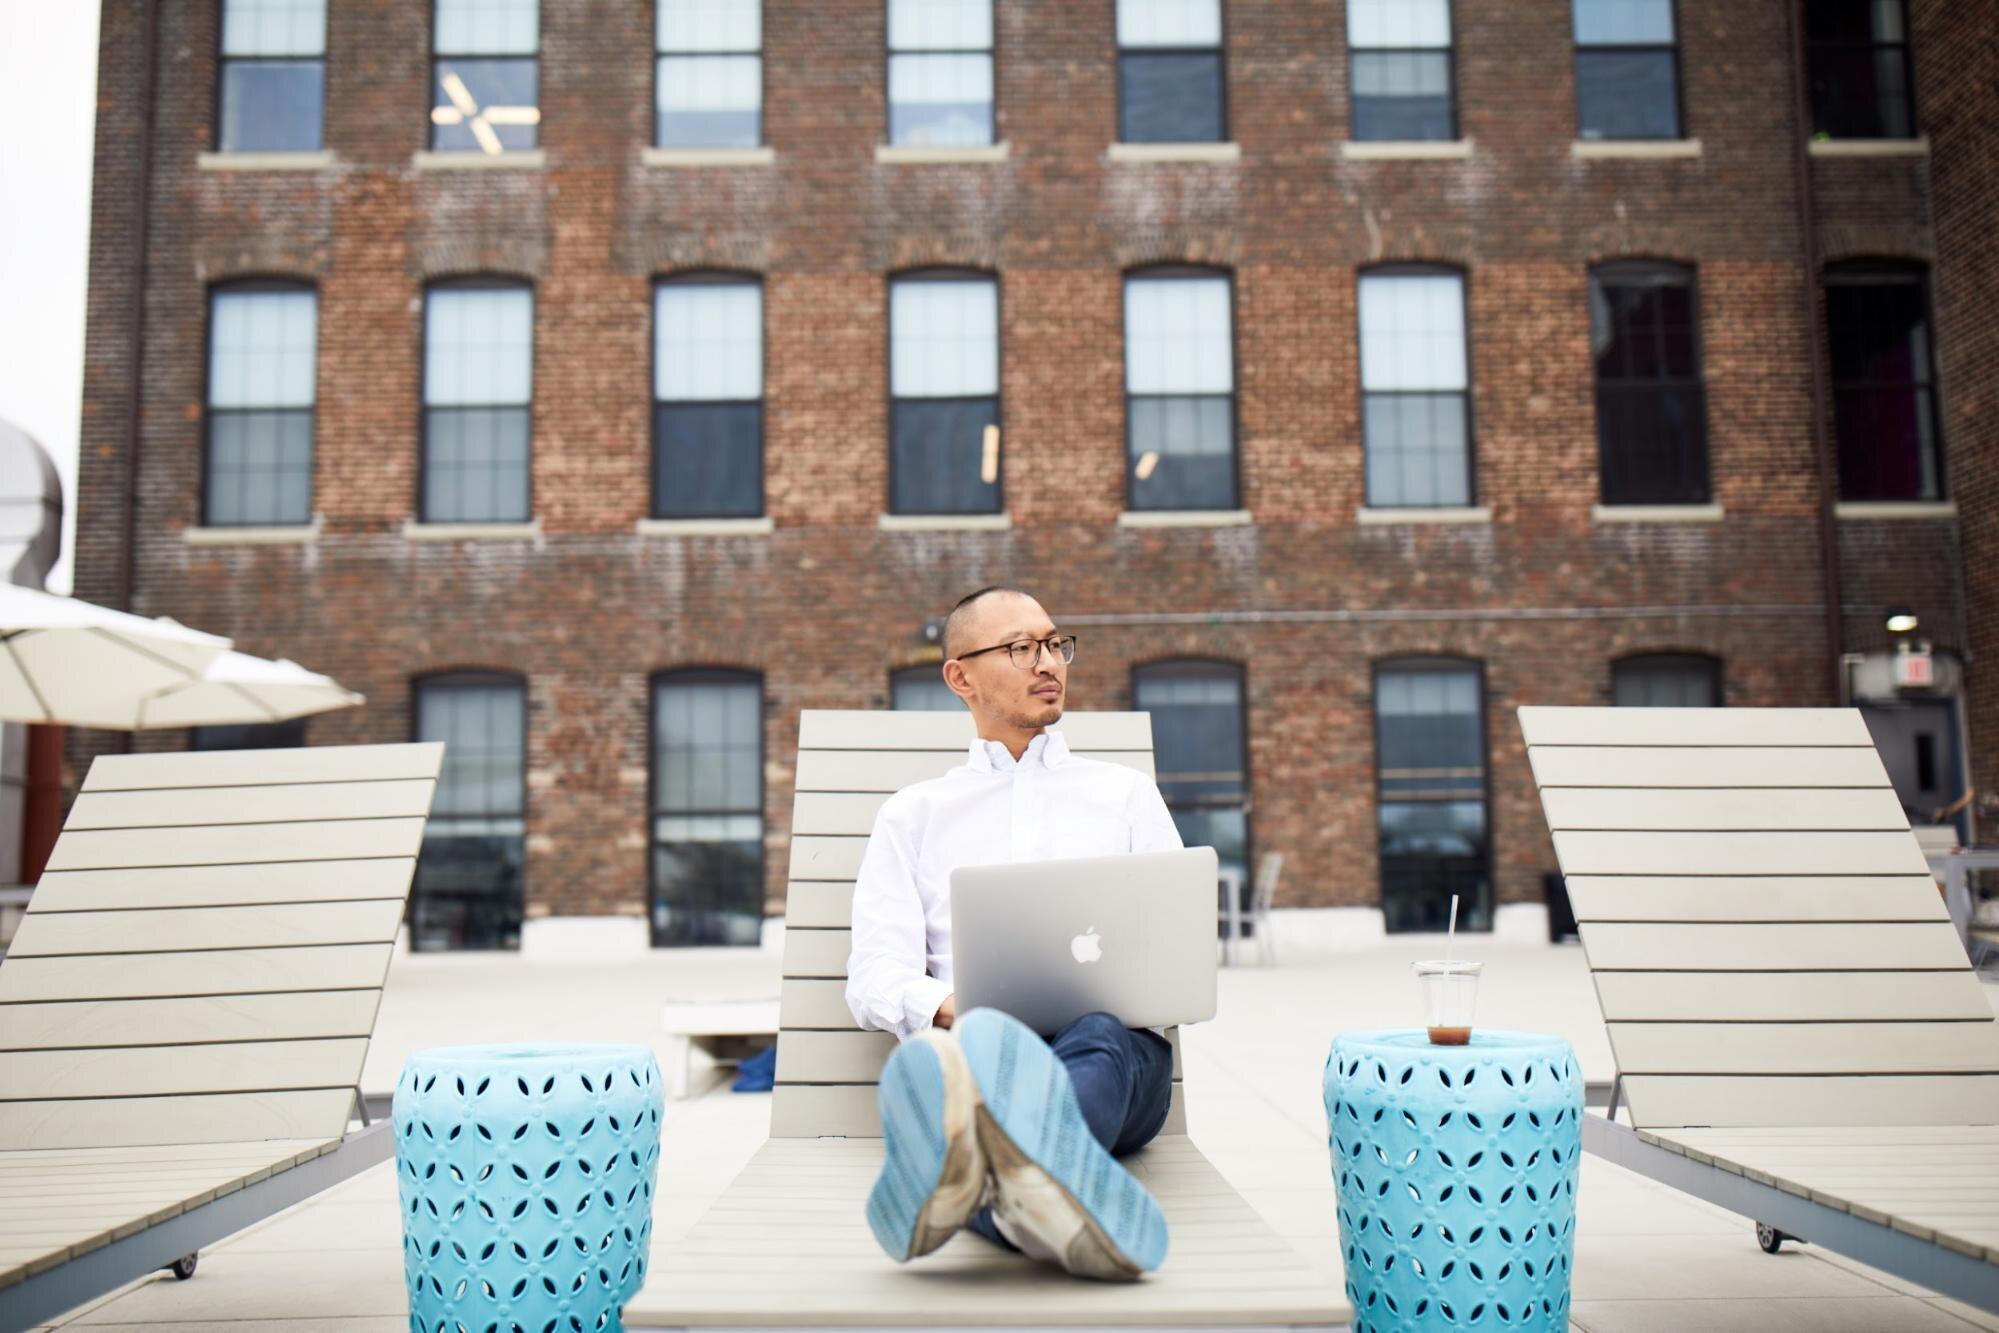 Man enjoying working from outside pool lounge area